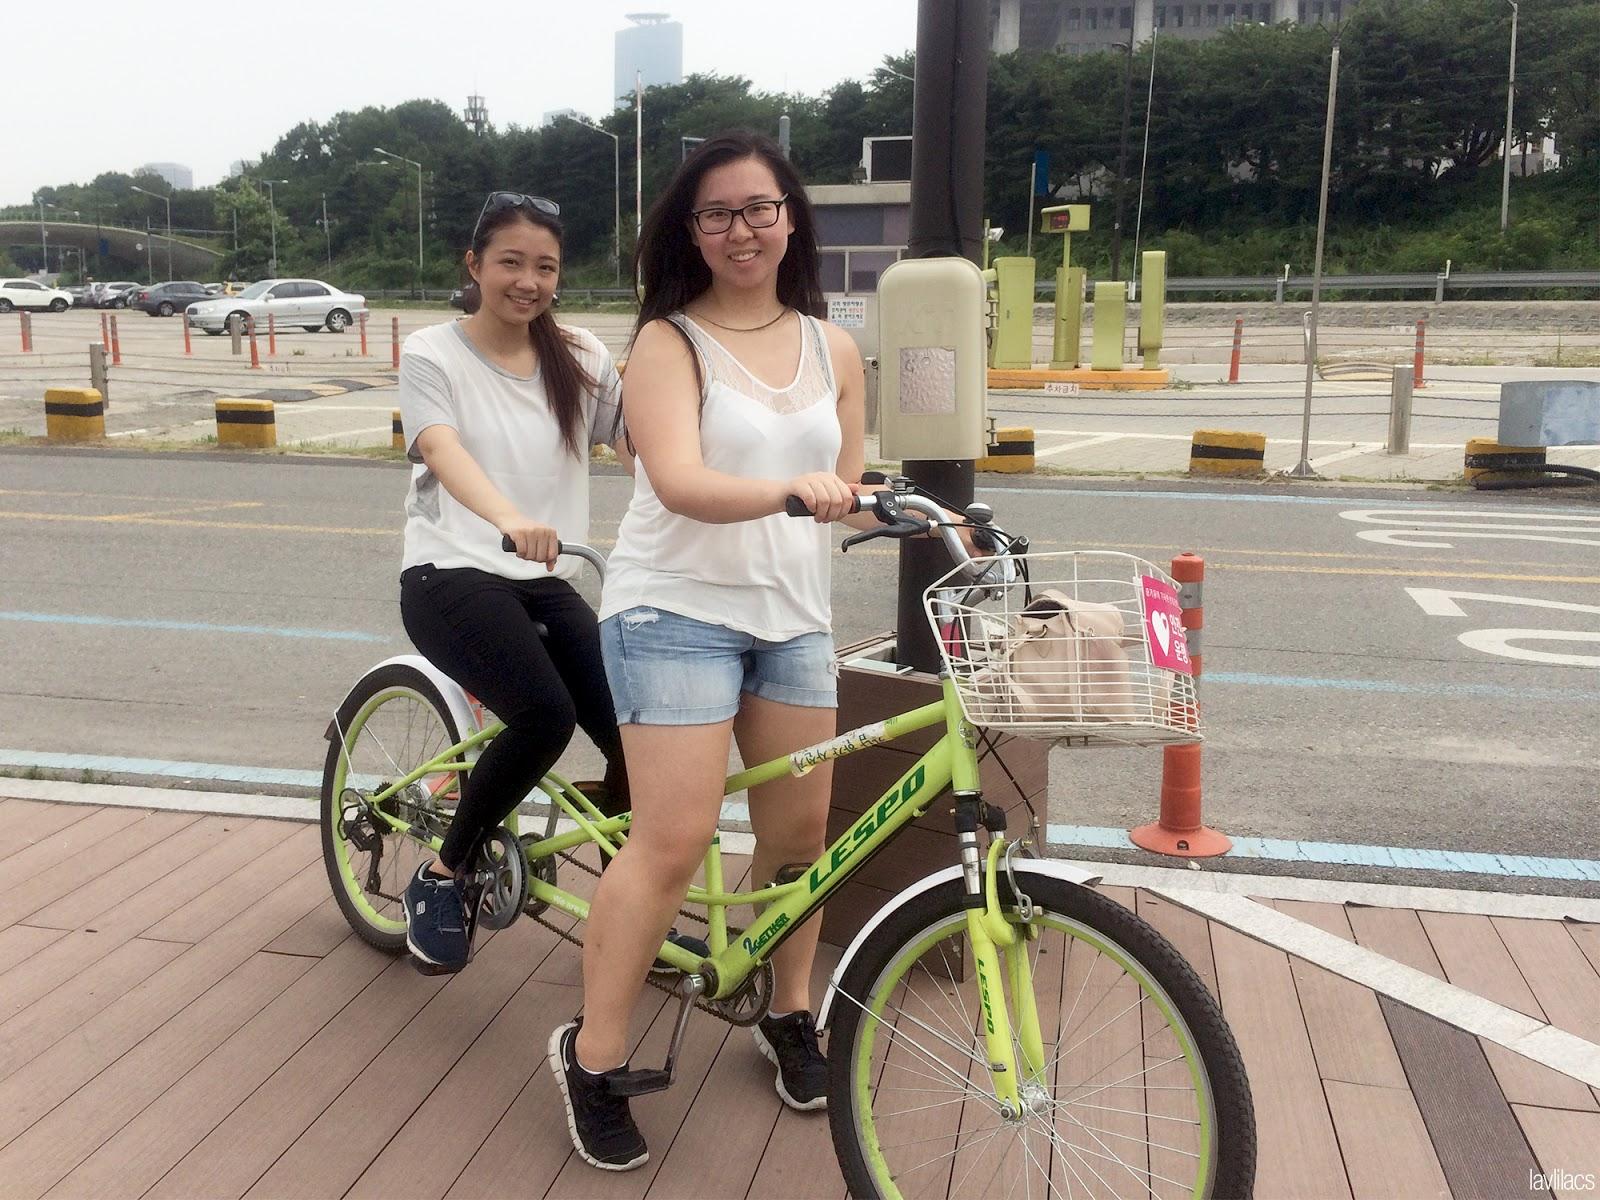 Seoul, Korea - Summer Study Abroad 2014 - Yeouido Park - Han River - tandem biking